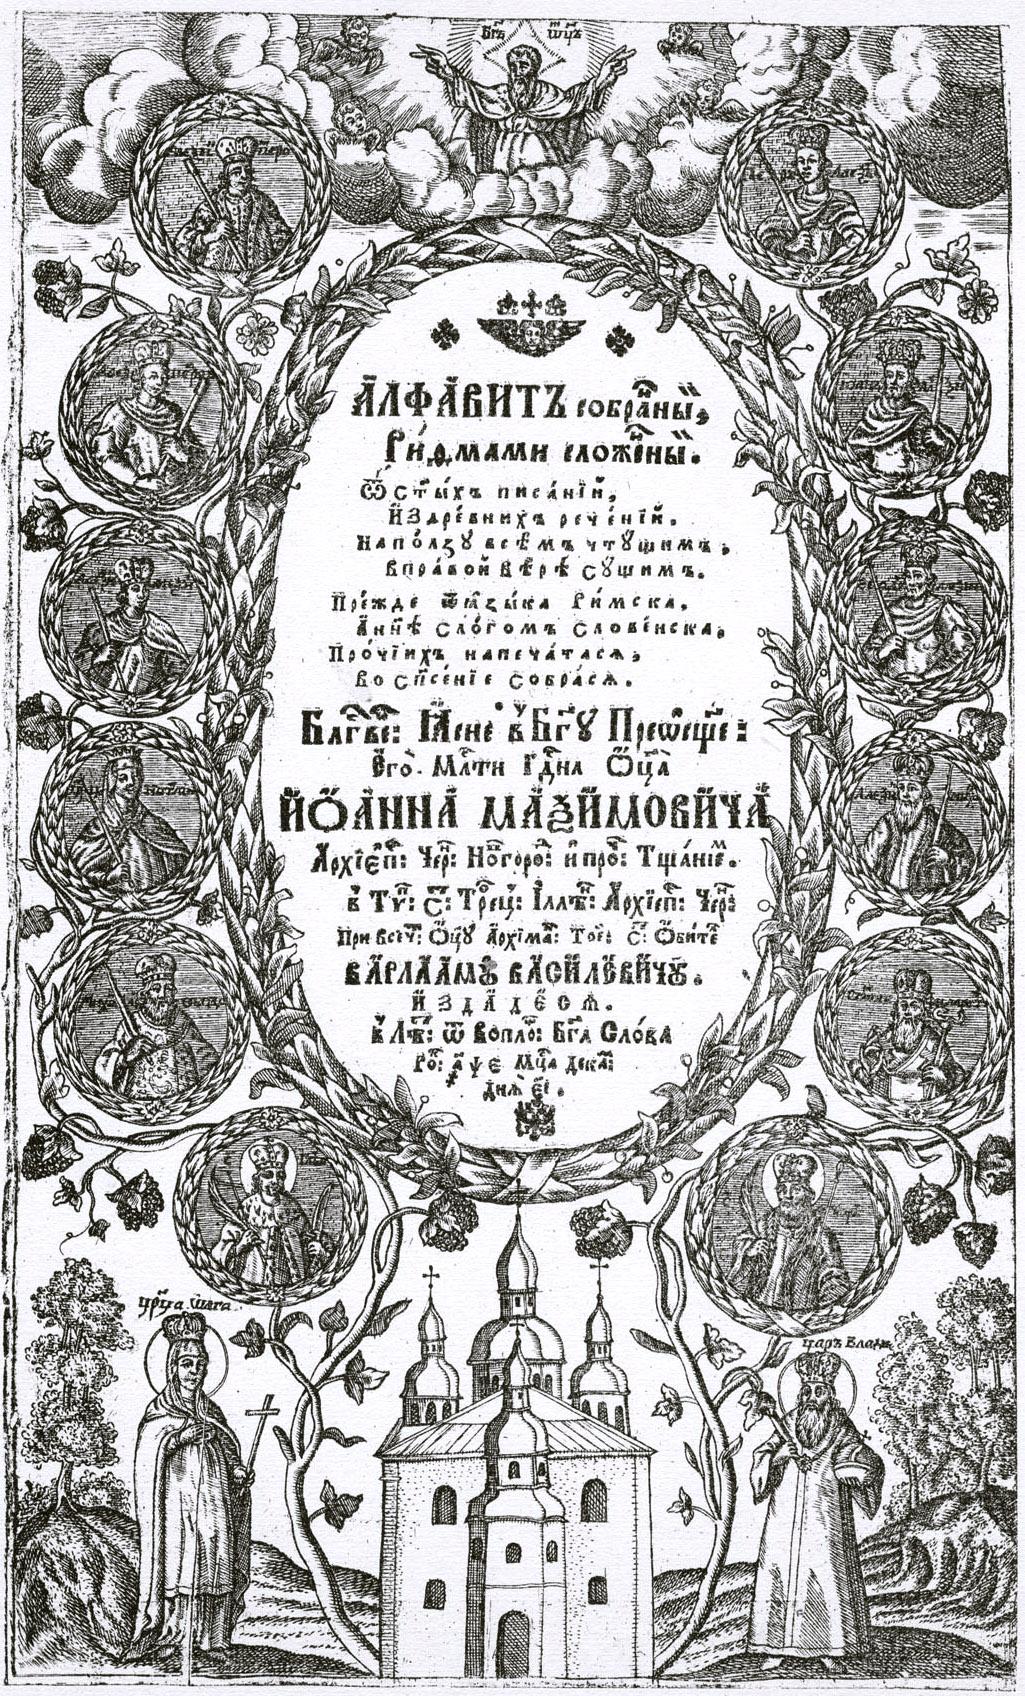 21. Заглавный лист к Алфавиту Максимовича 1705 года